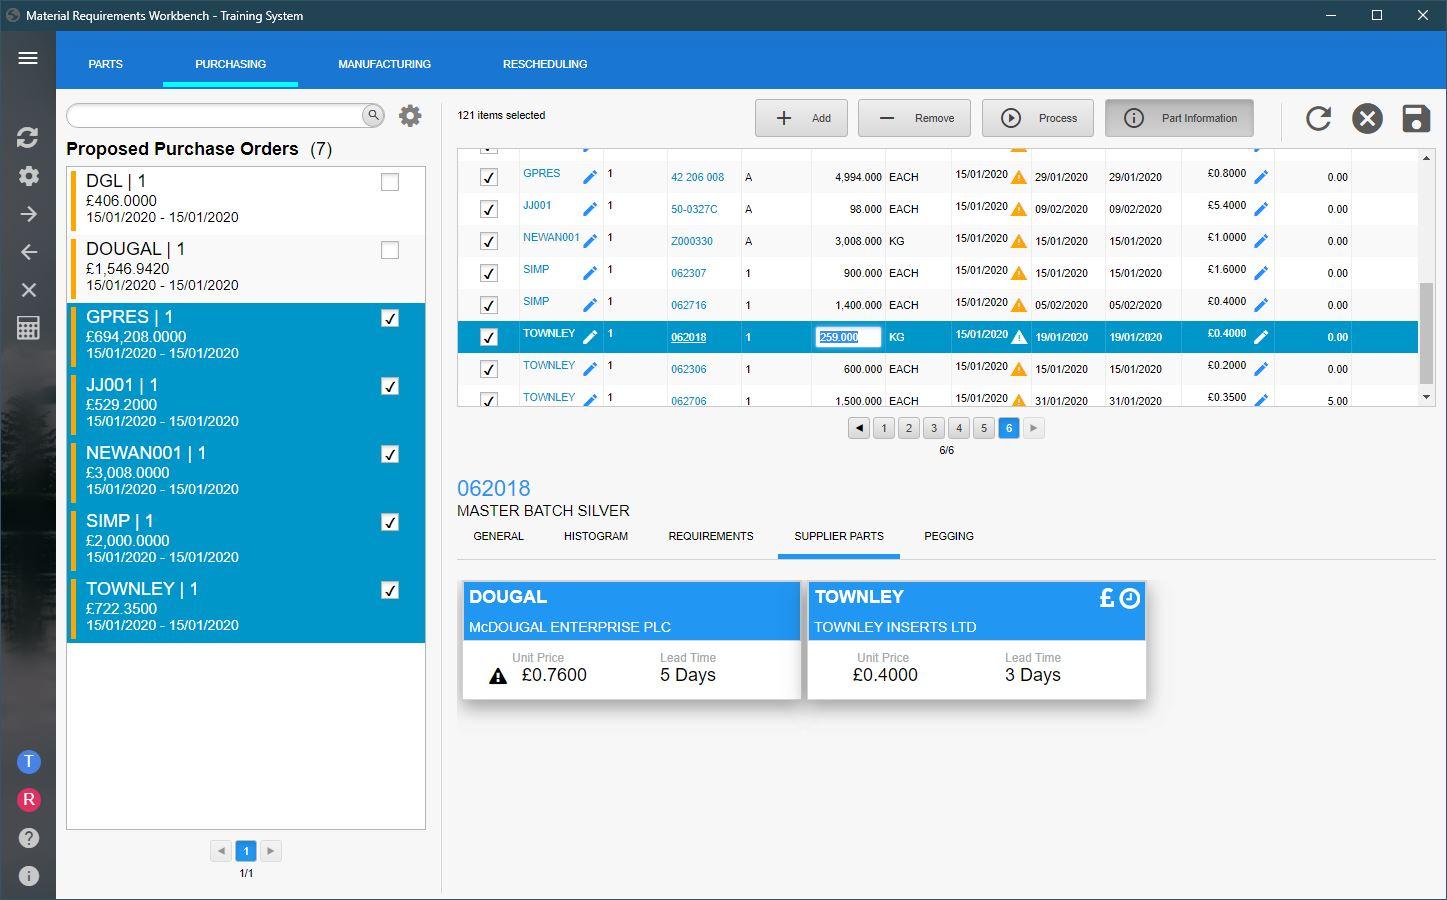 MRP Workbench screenshot